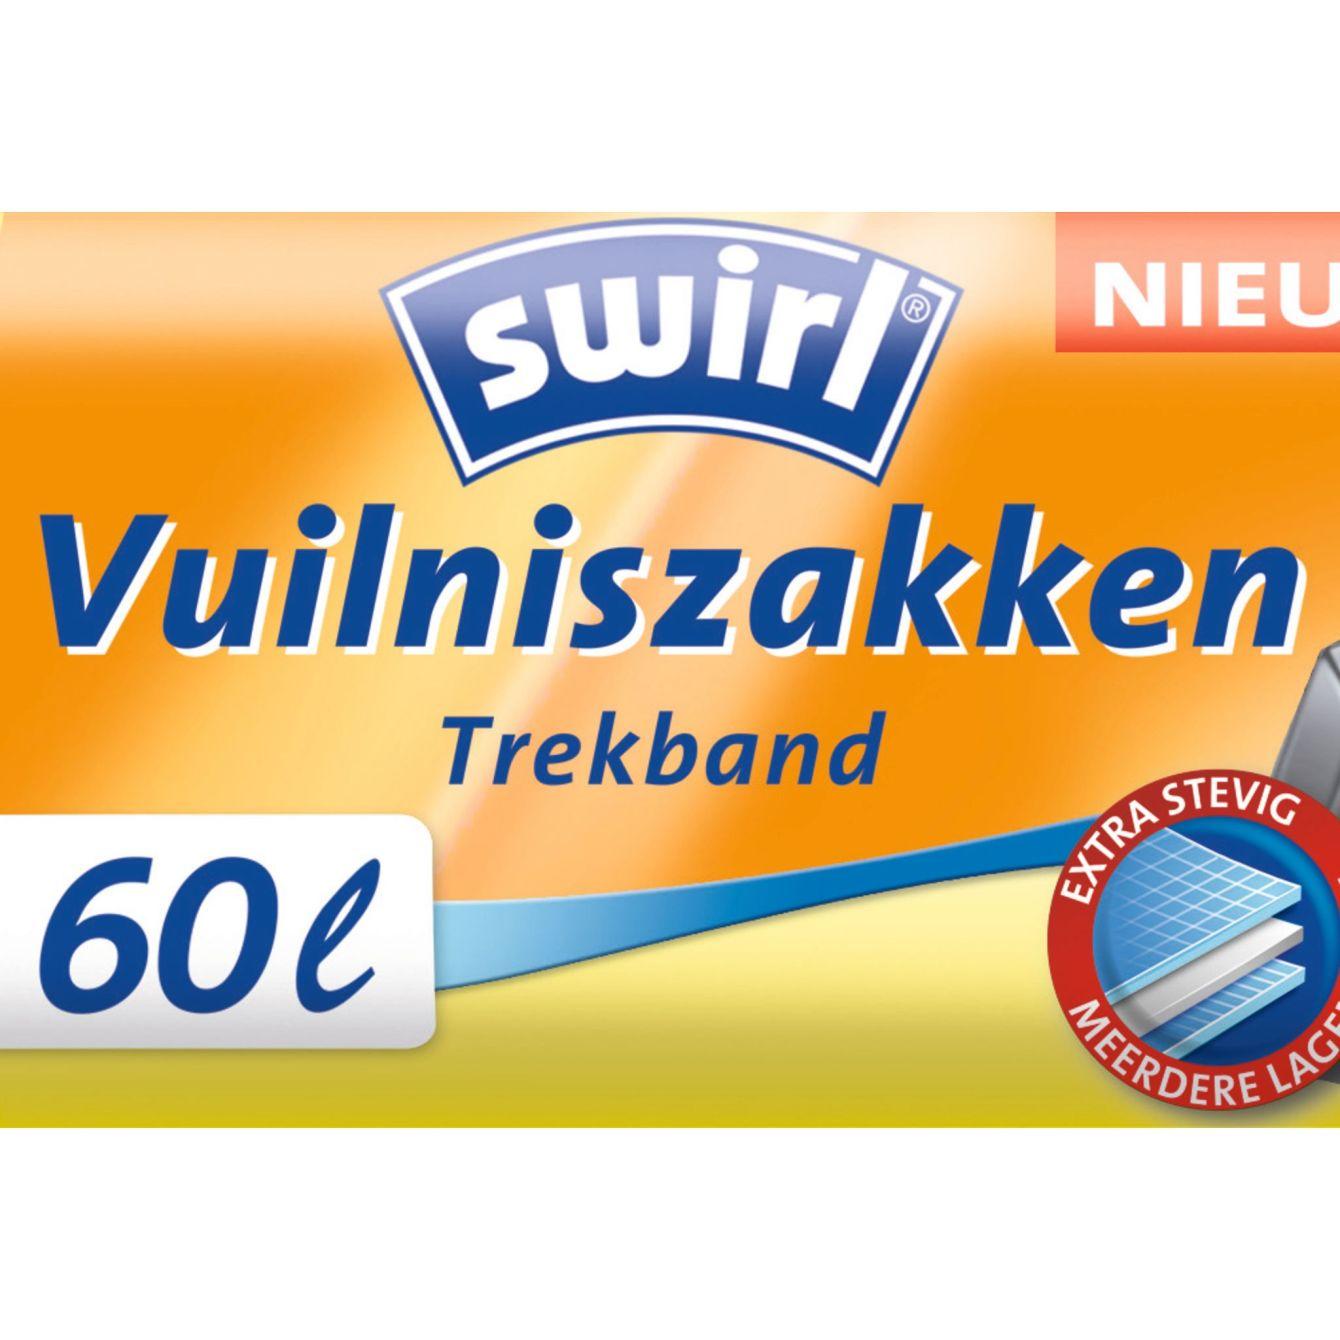 Swirl Vuilniszakken Trekband 60 Liter